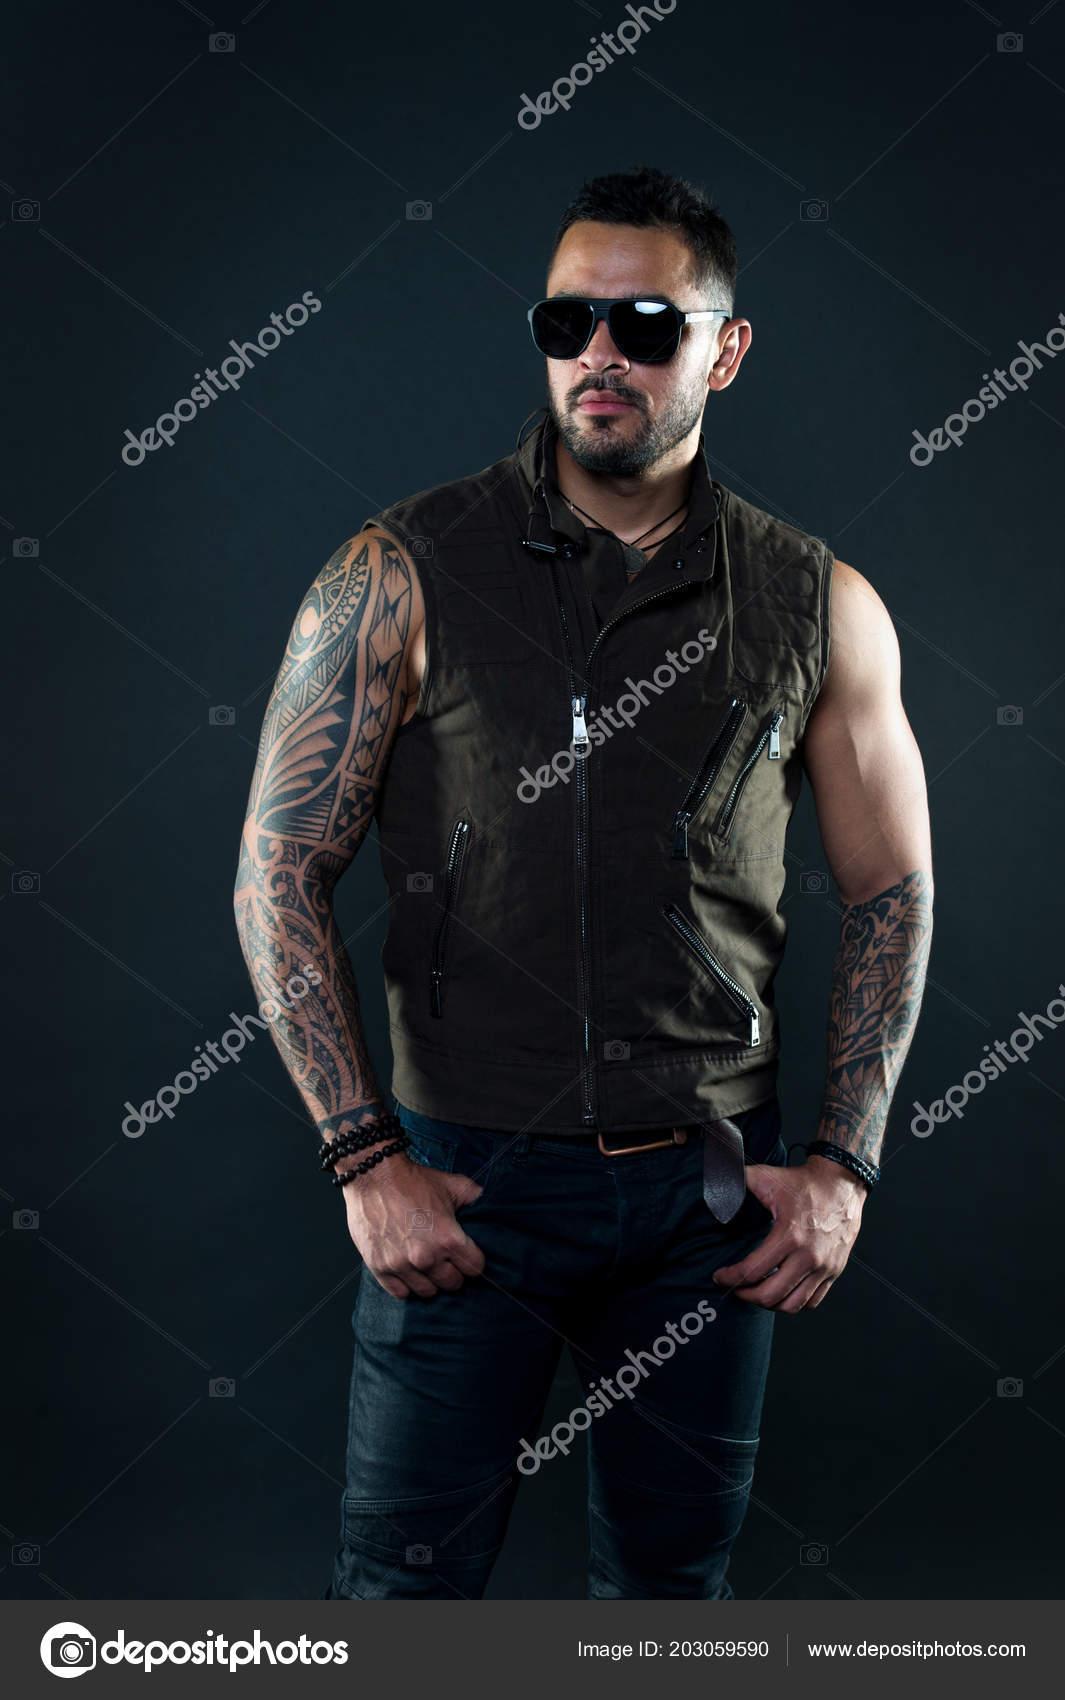 b93bf6eab470ae Tattoo model met baard op ongeschoren gezicht. Bebaarde man met tatoeage op  sterke armen. Mode macho in trendy zonnebril. Fashion stijl en trend — Foto  van ...